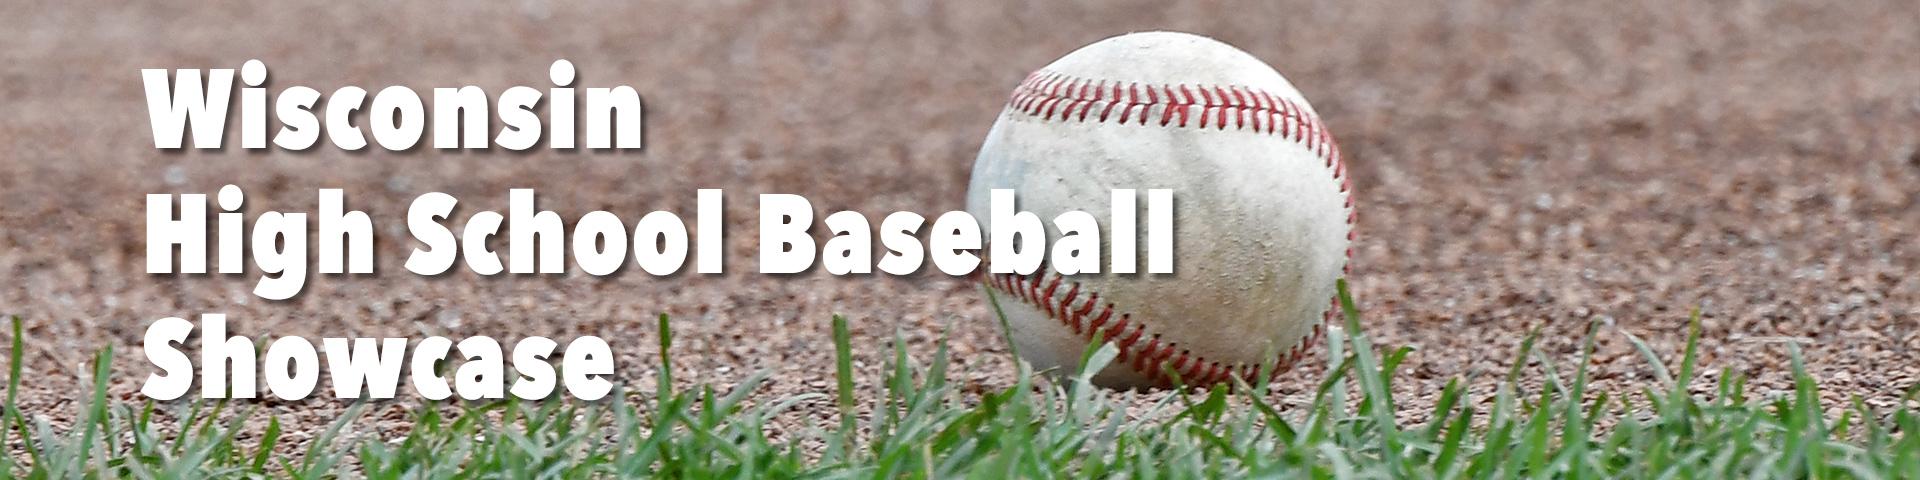 Wisconsin High School Baseball Showcase banner